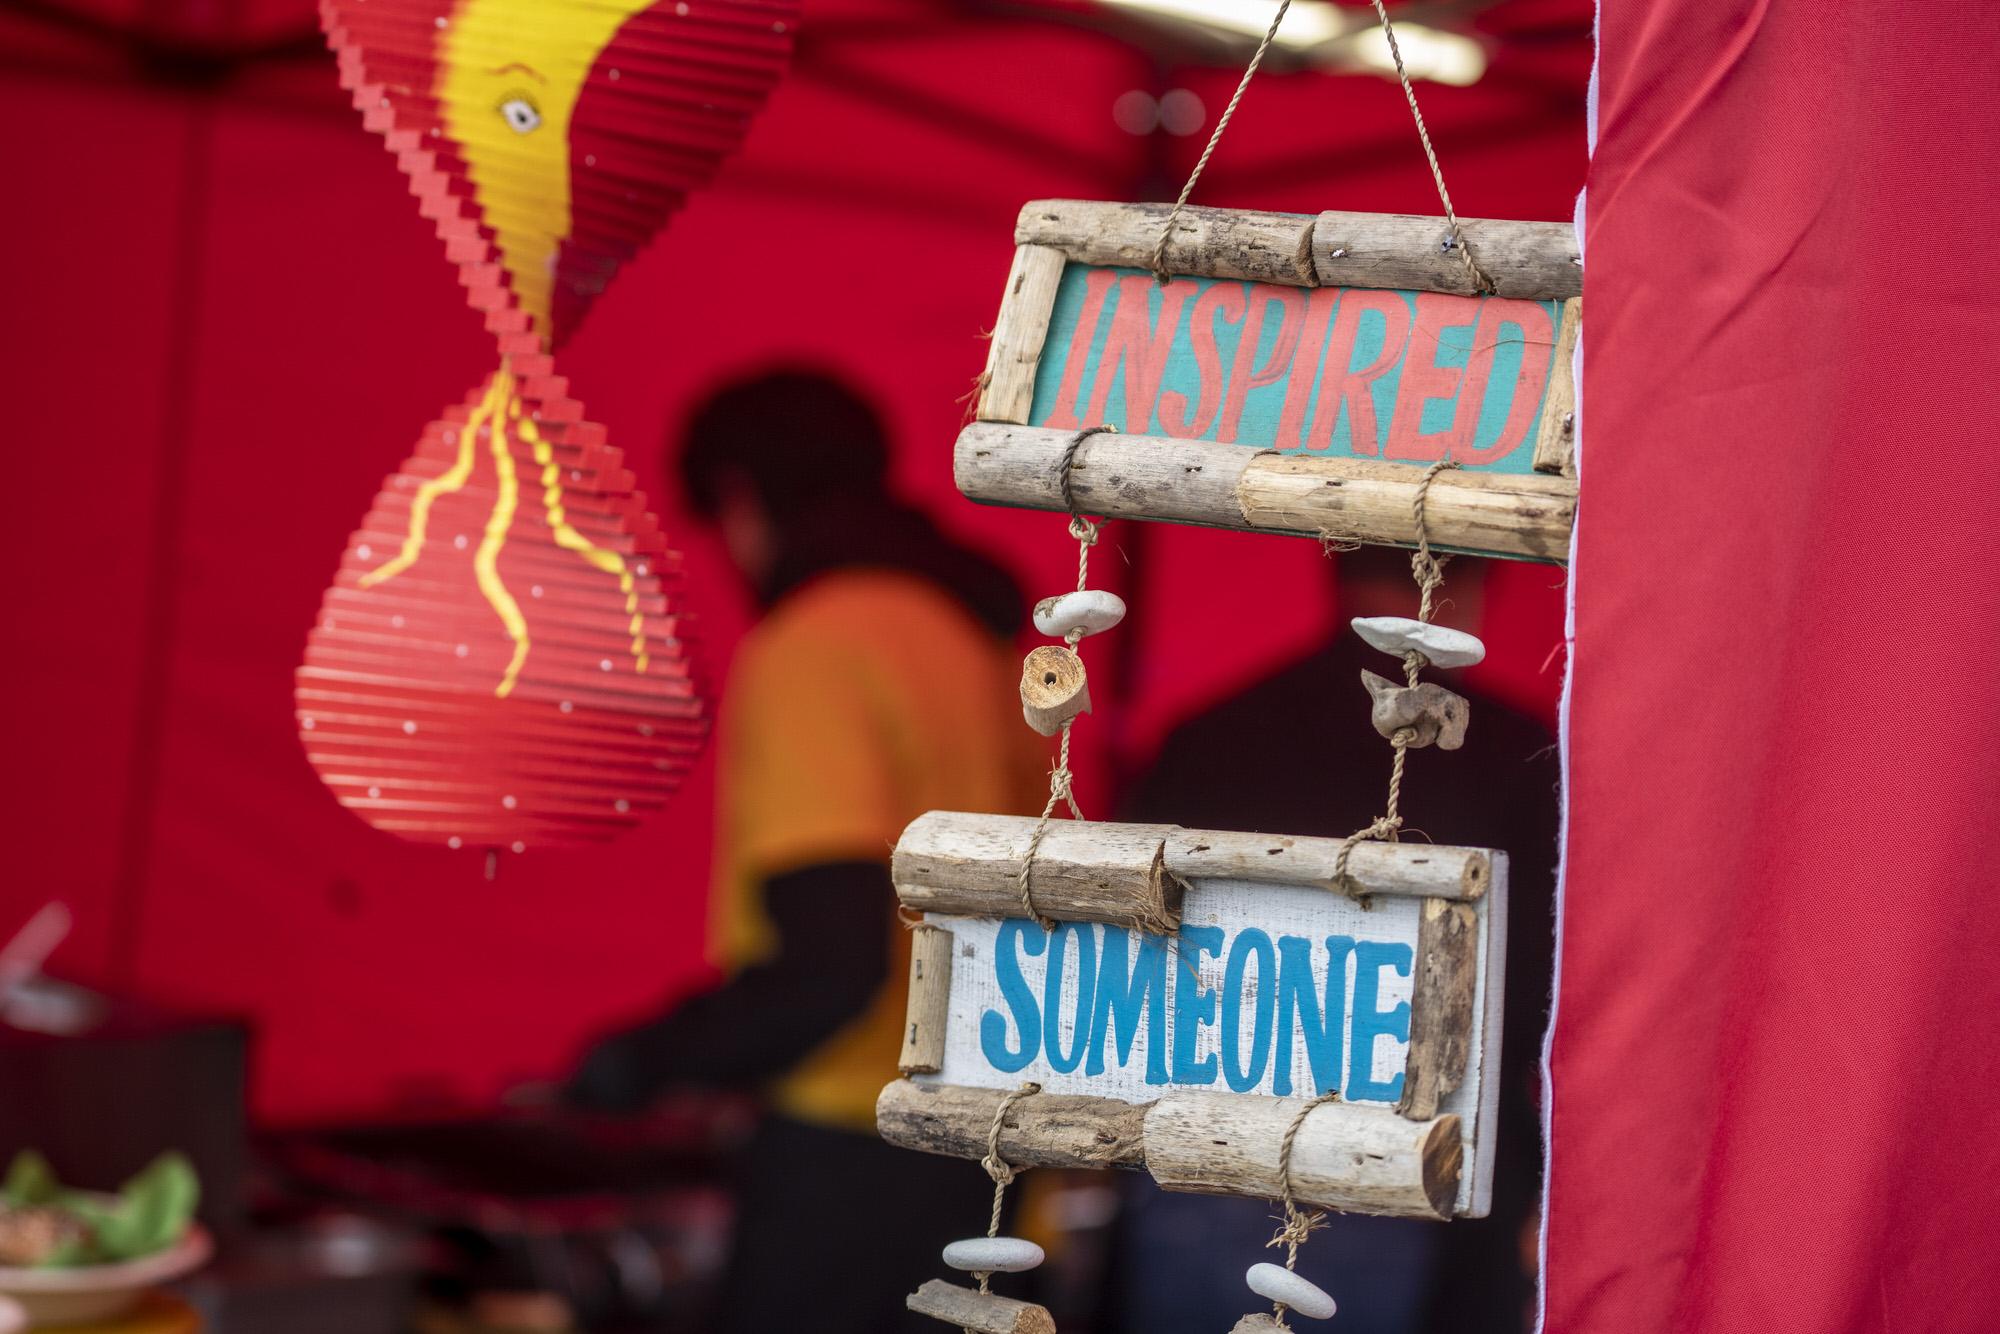 SPIJS-foodfestival-5juni21-00013.jpg